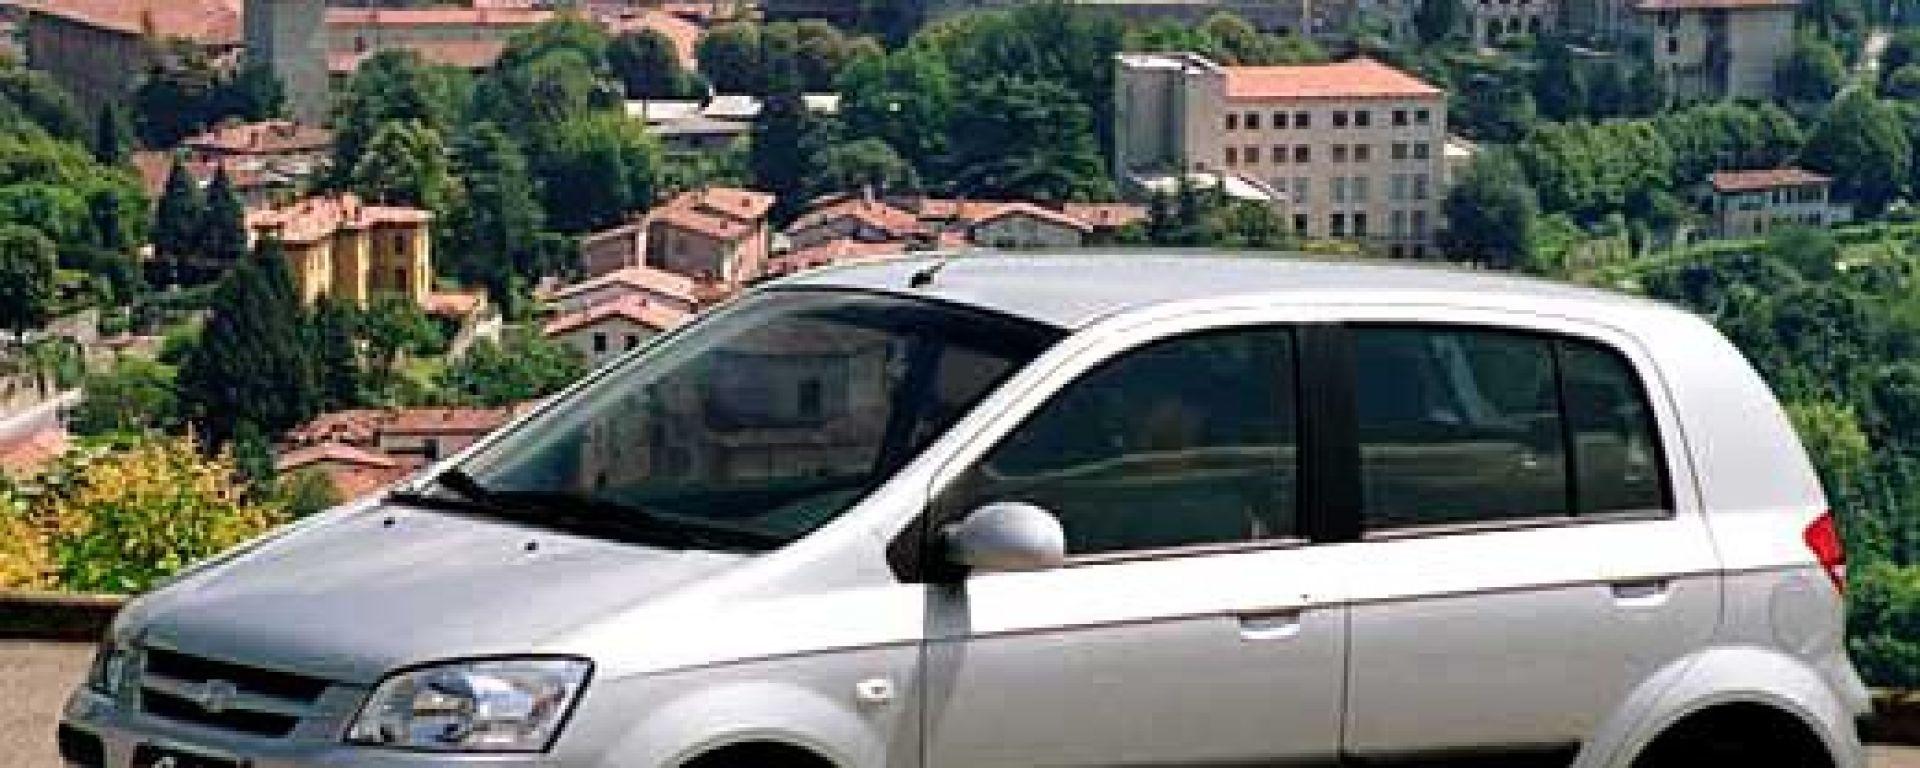 Crash test: Hyundai Getz